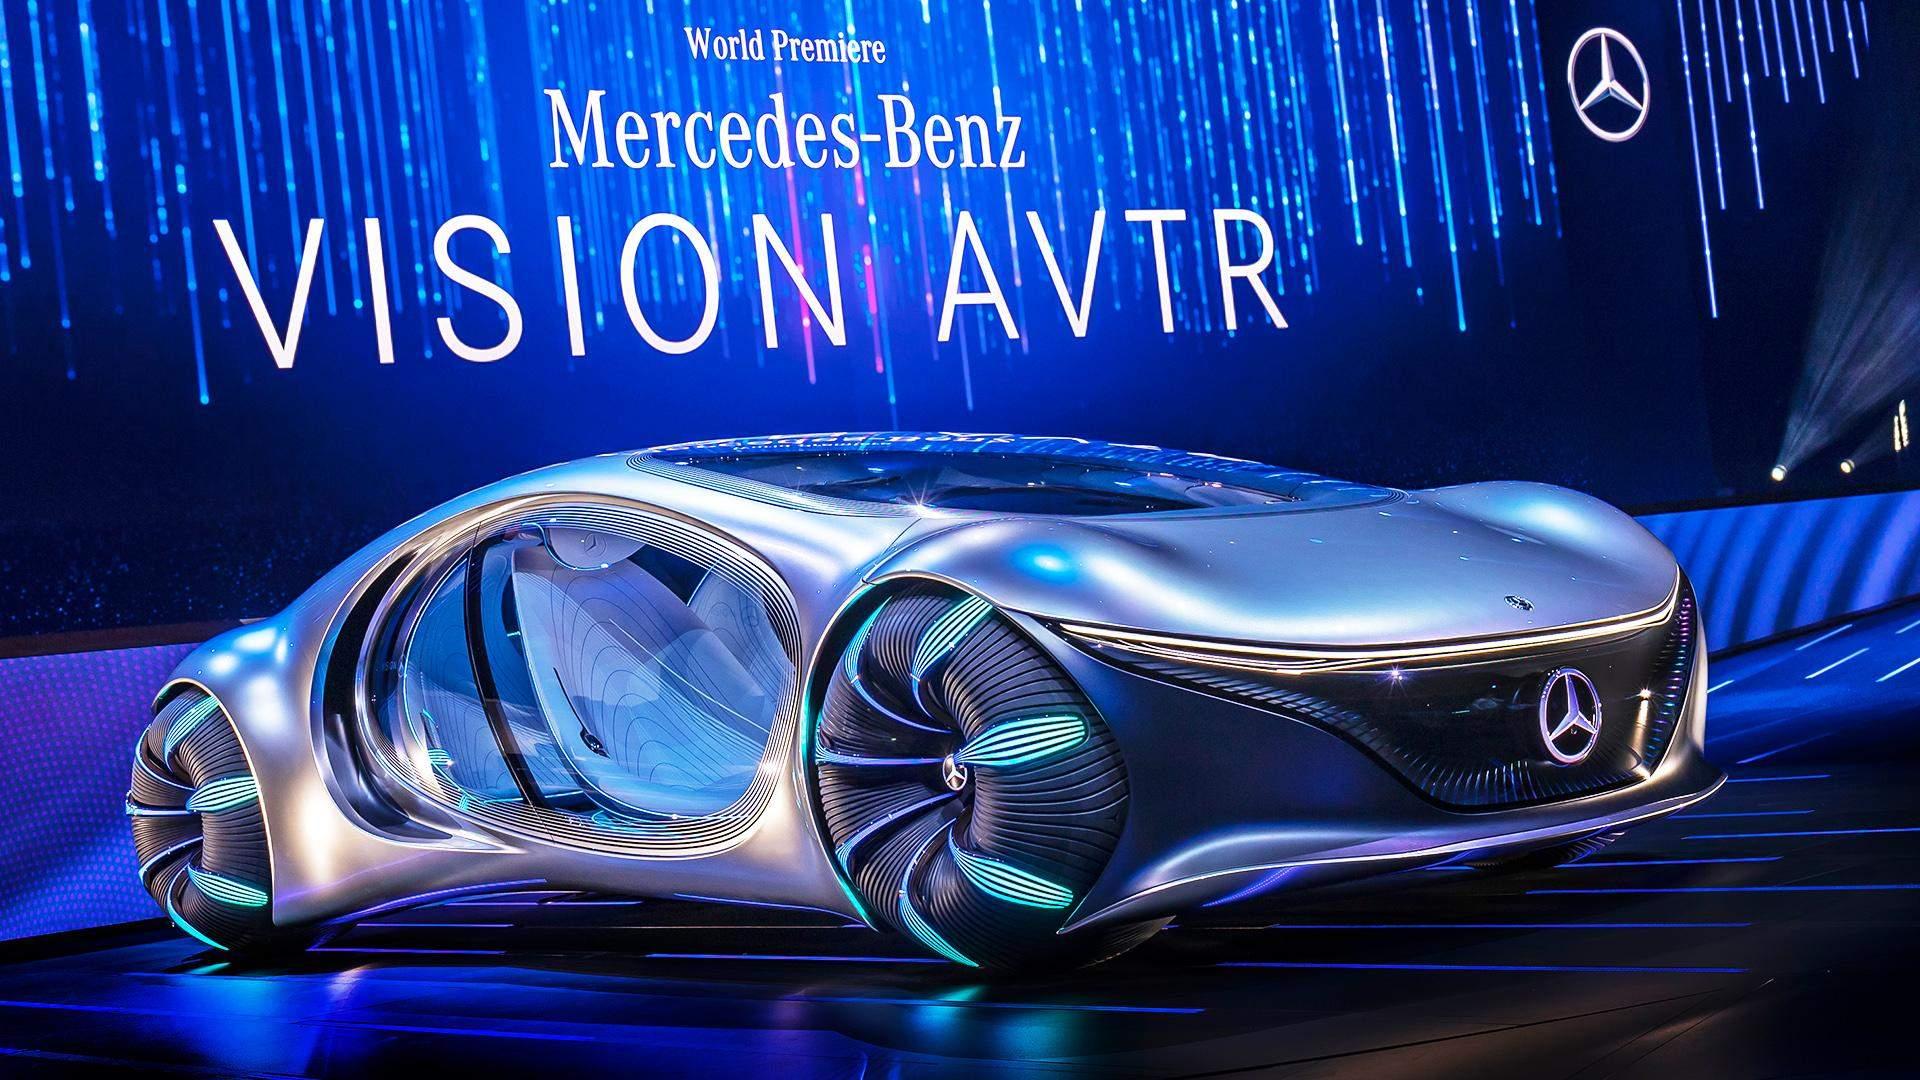 2020 Mercedes Vision AVTR - Concept with Avatar Genes - newsR VIDEO